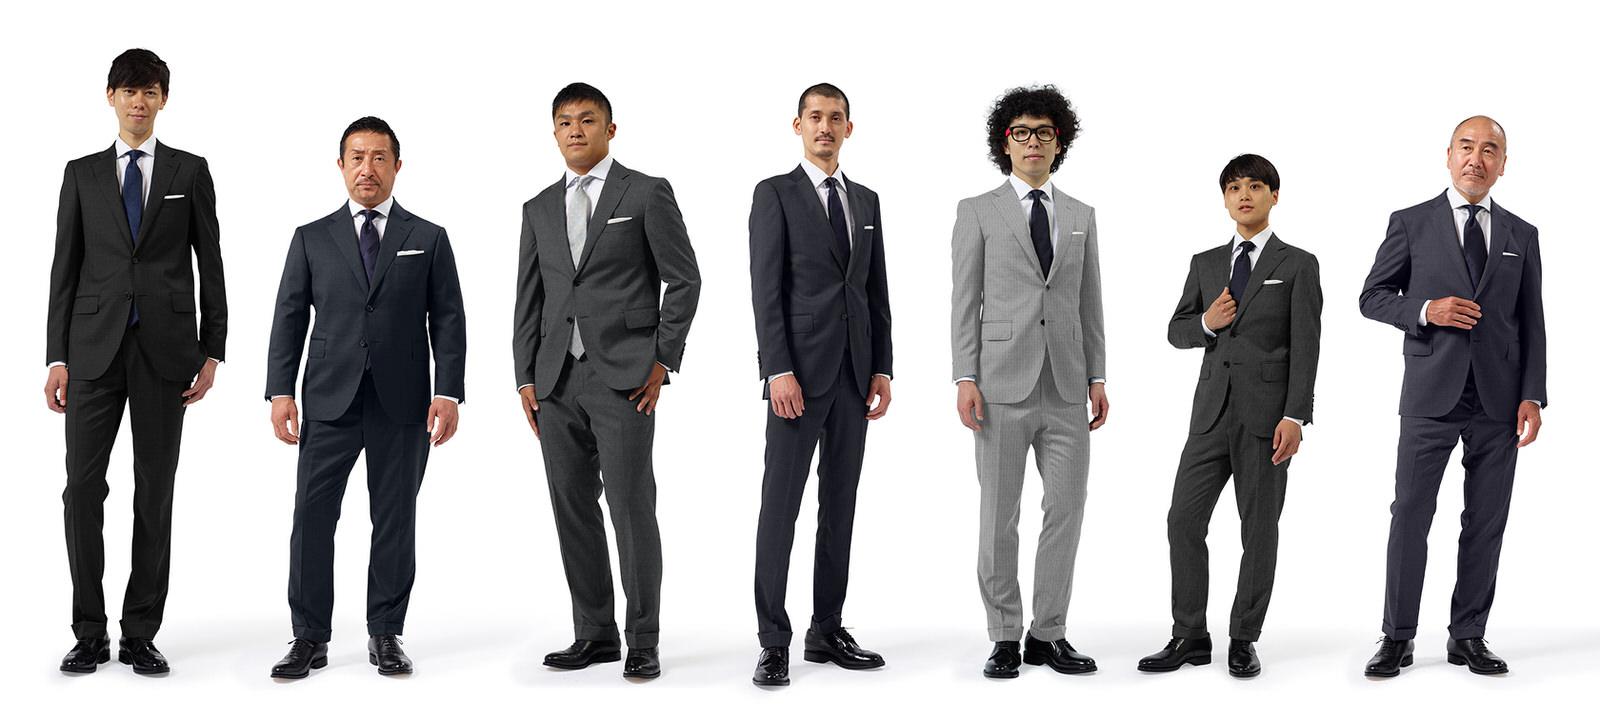 ZOZO、完全オーダーメイドの「ビジネススーツ」を販売開始 お試しセット価格24,800円